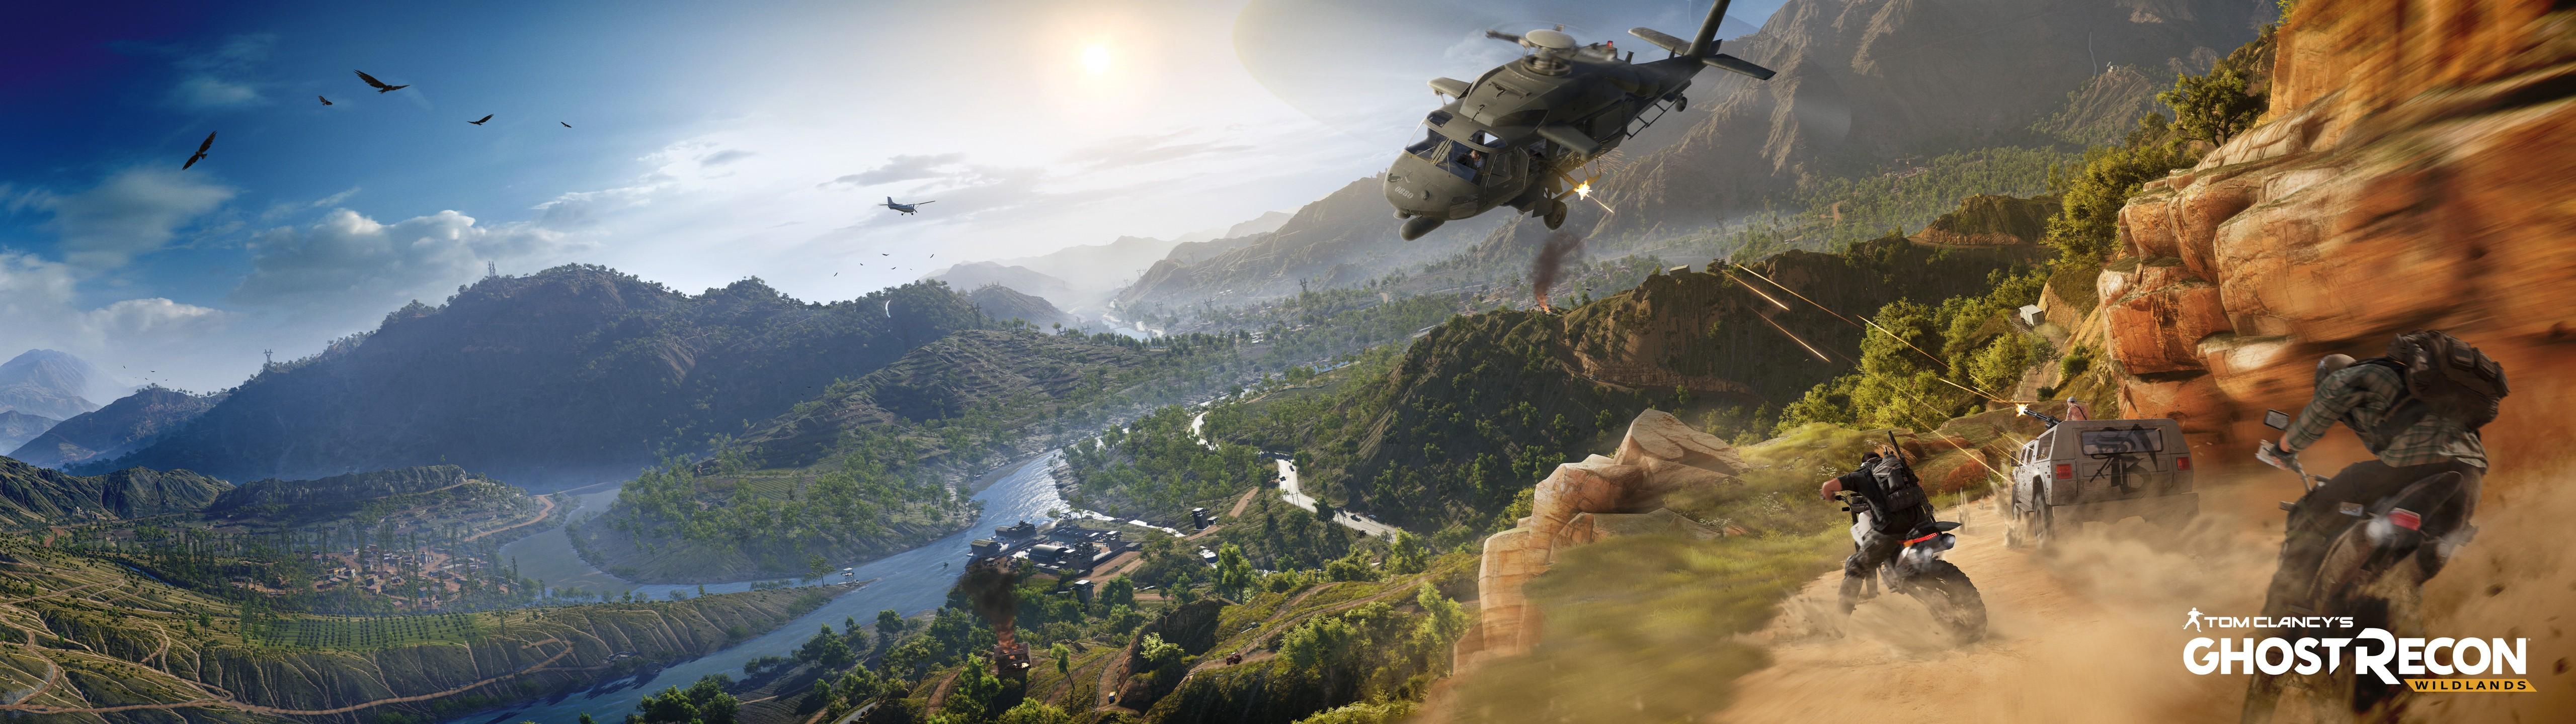 Wallpaper Video Games Tom Clancy S Ghost Recon Wildlands